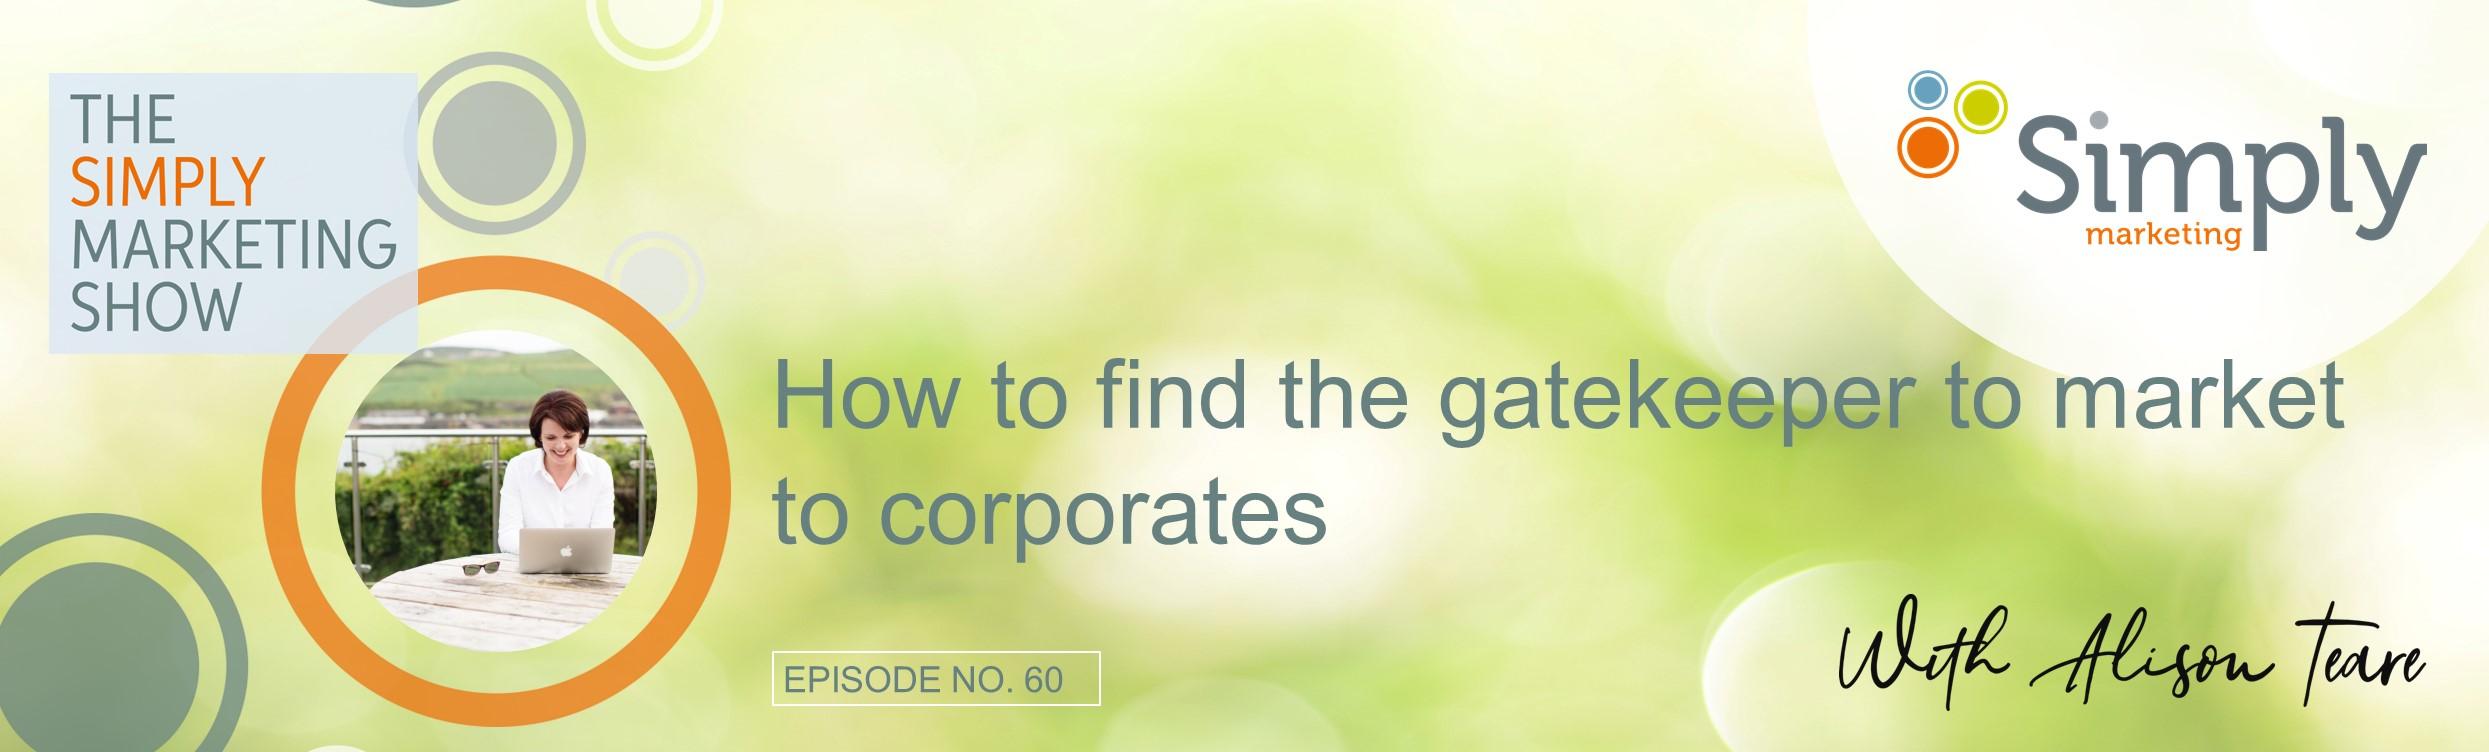 market to corporates